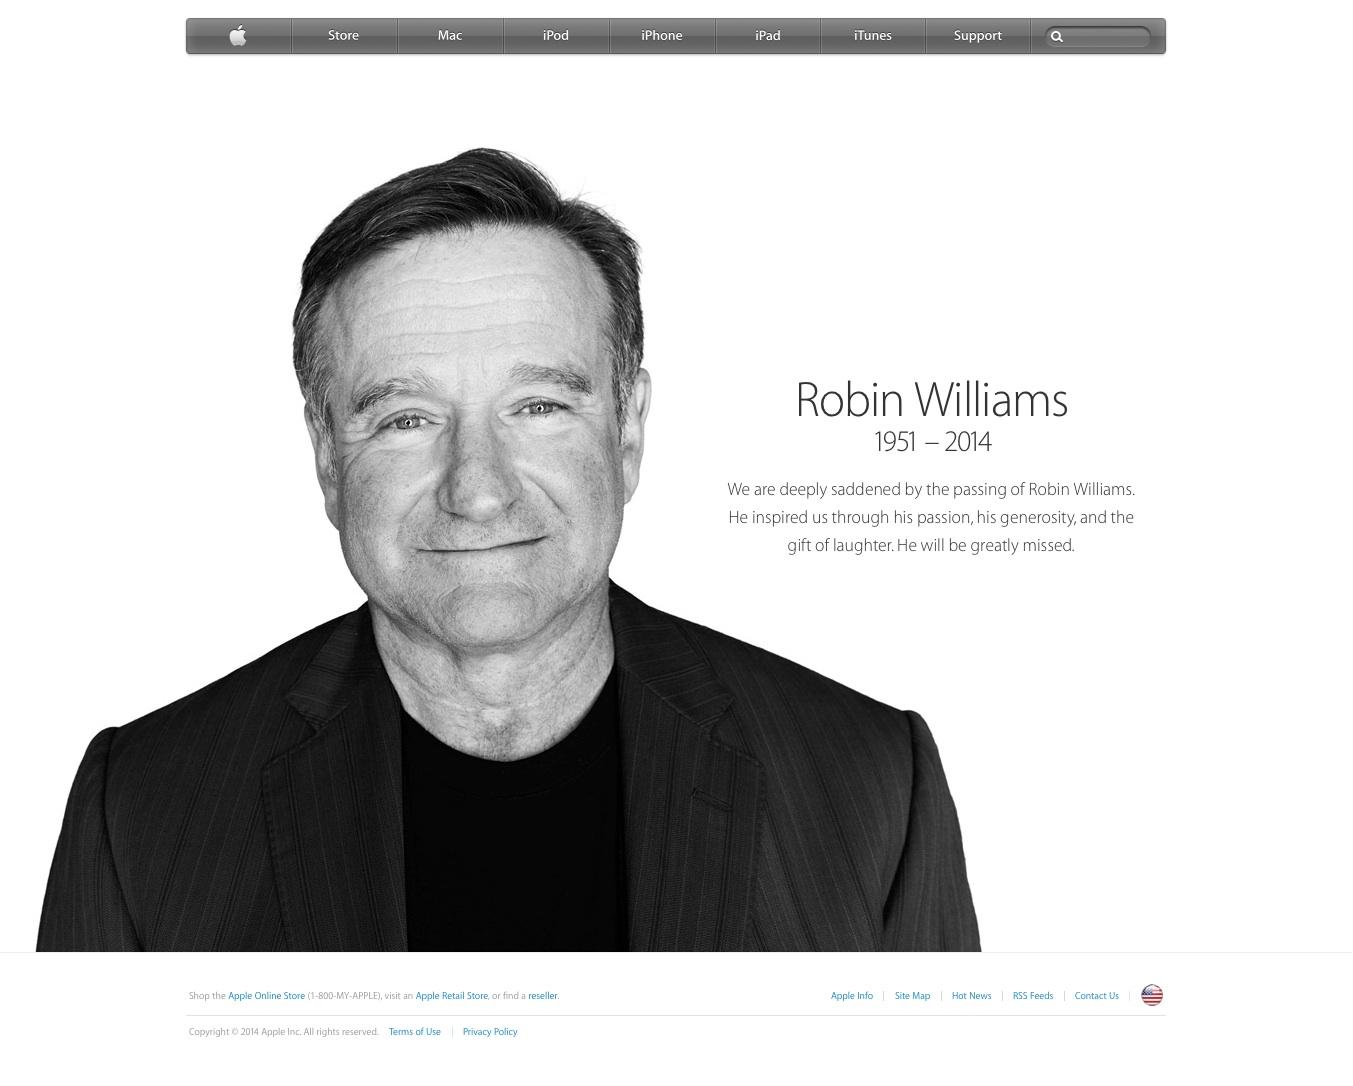 sihirli-elma-robin-williams-apple-com